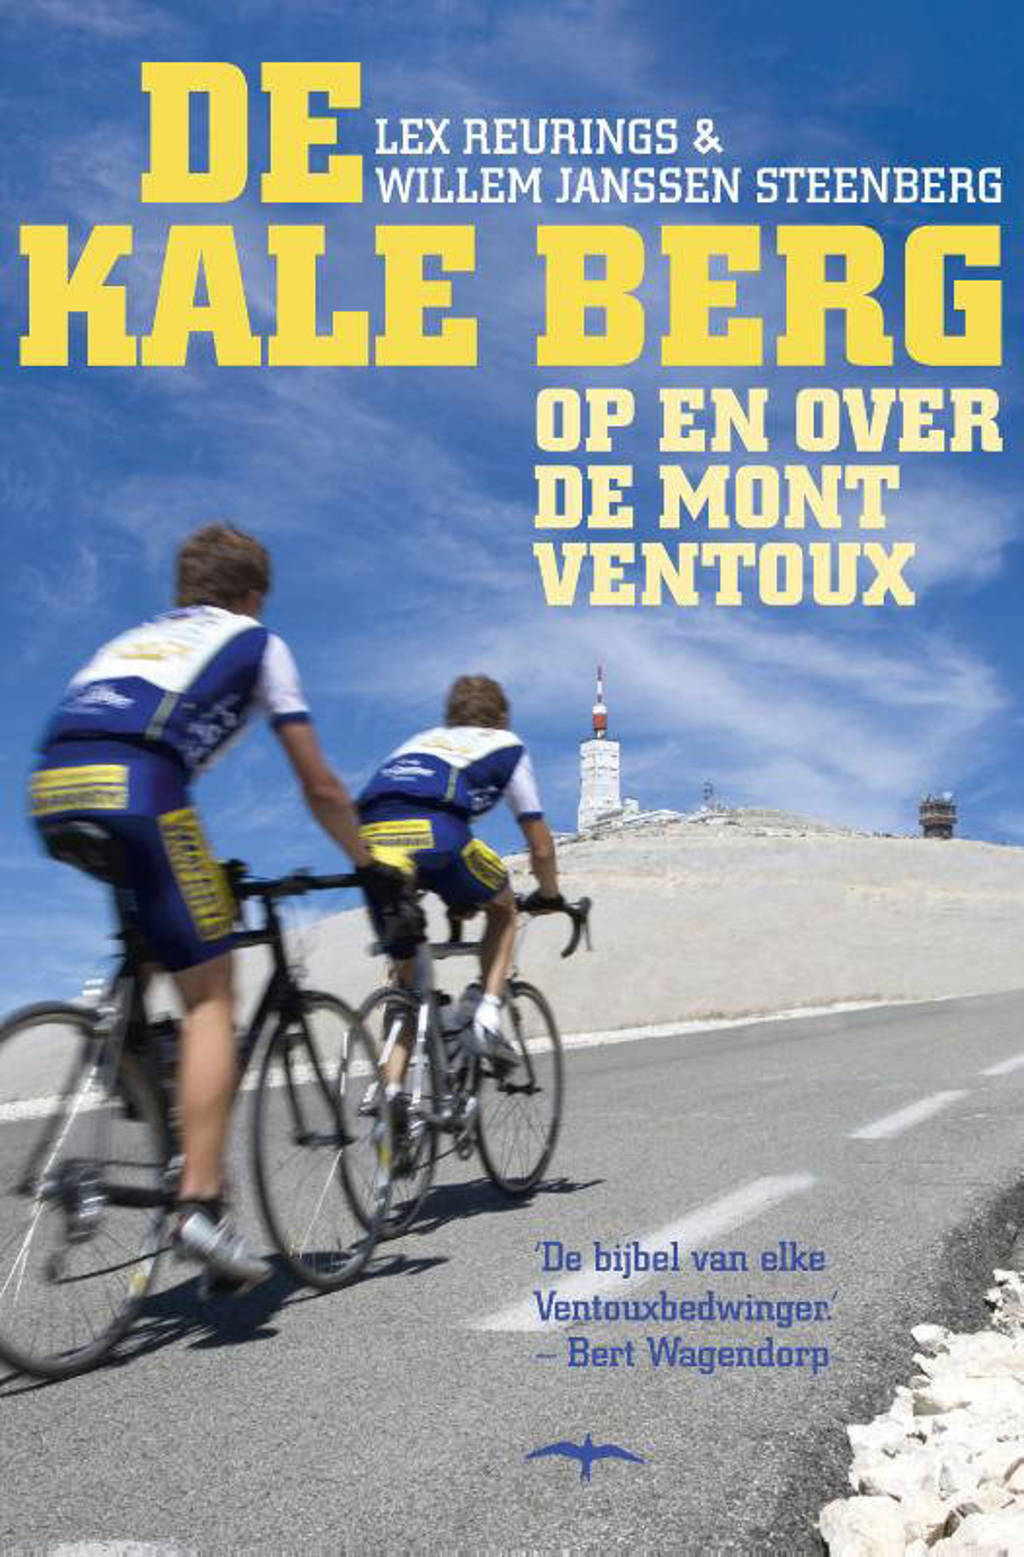 De kale berg - Lex Reurings en Willem Janssen Steenberg